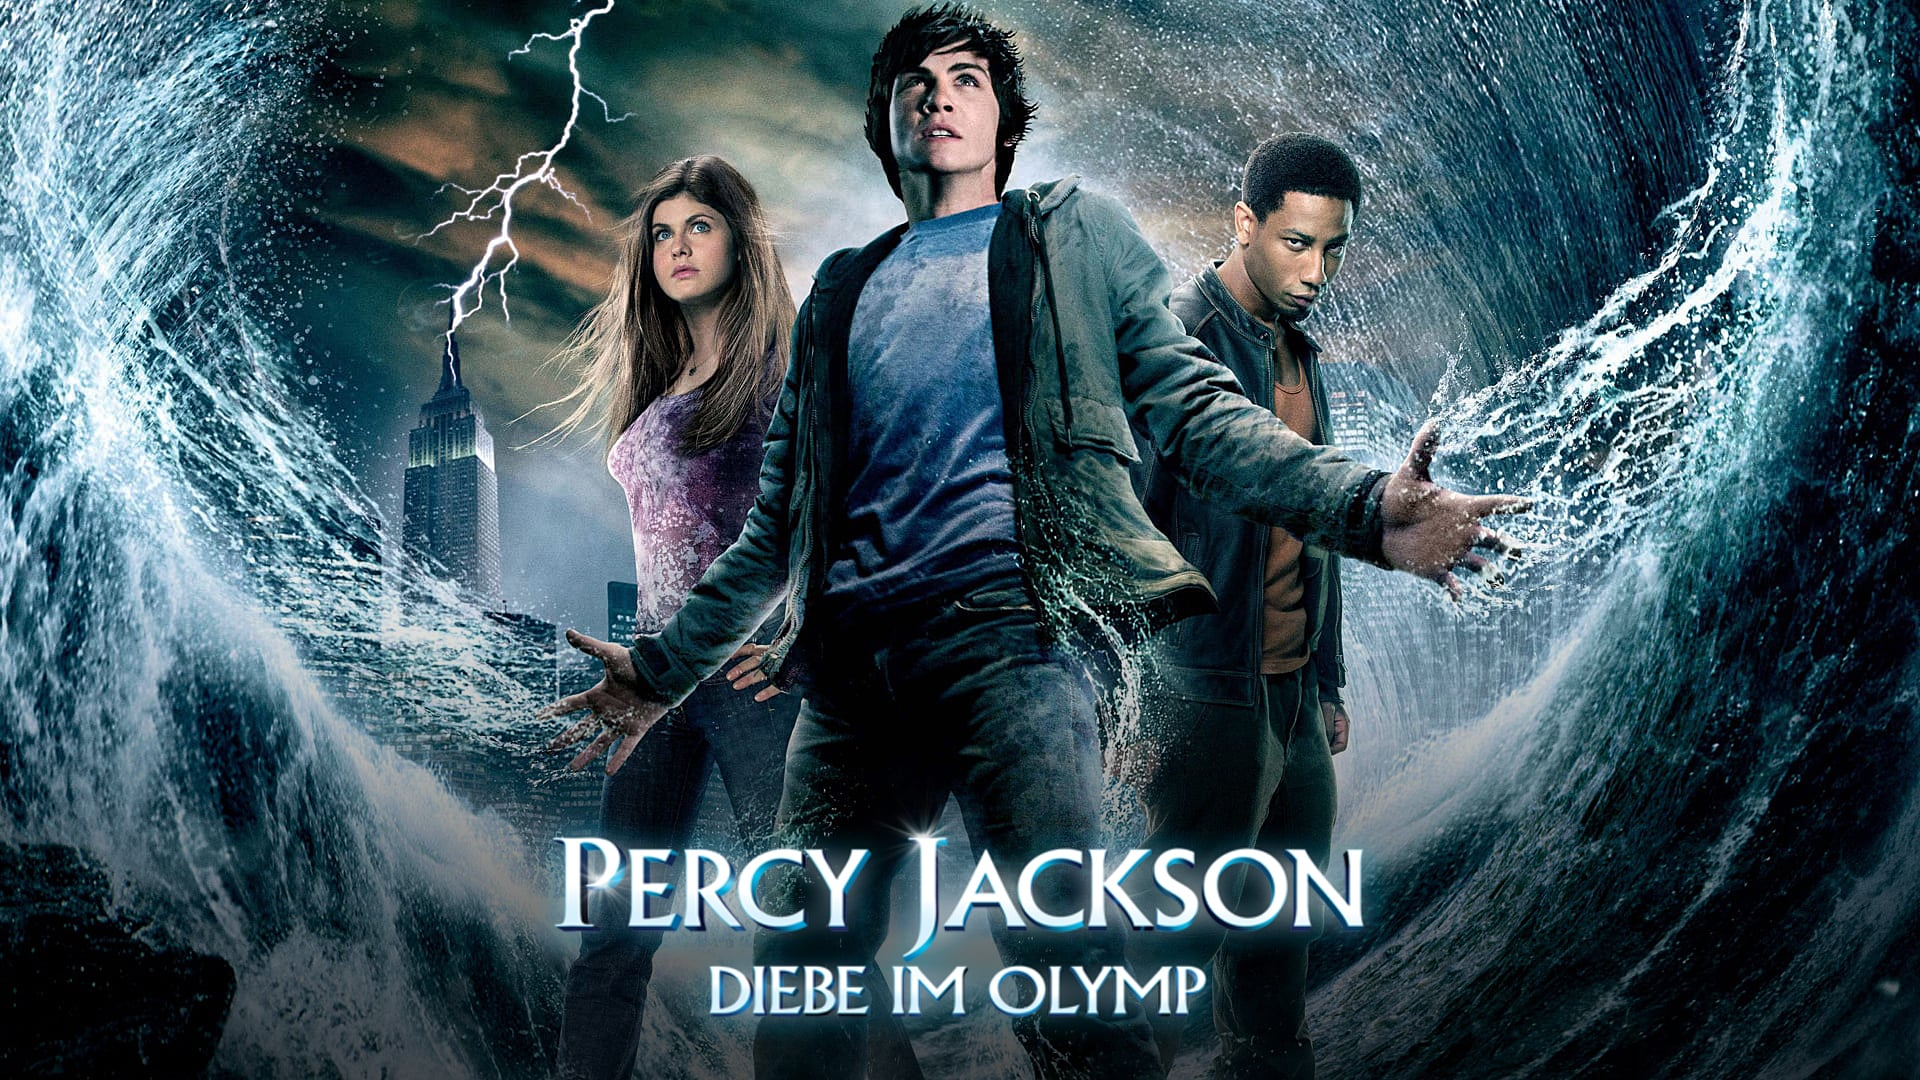 Percy Jackson, Le Voleur De Foudre - Movie - Zone destiné Percy Jackson Et Le Voleur De Foudre